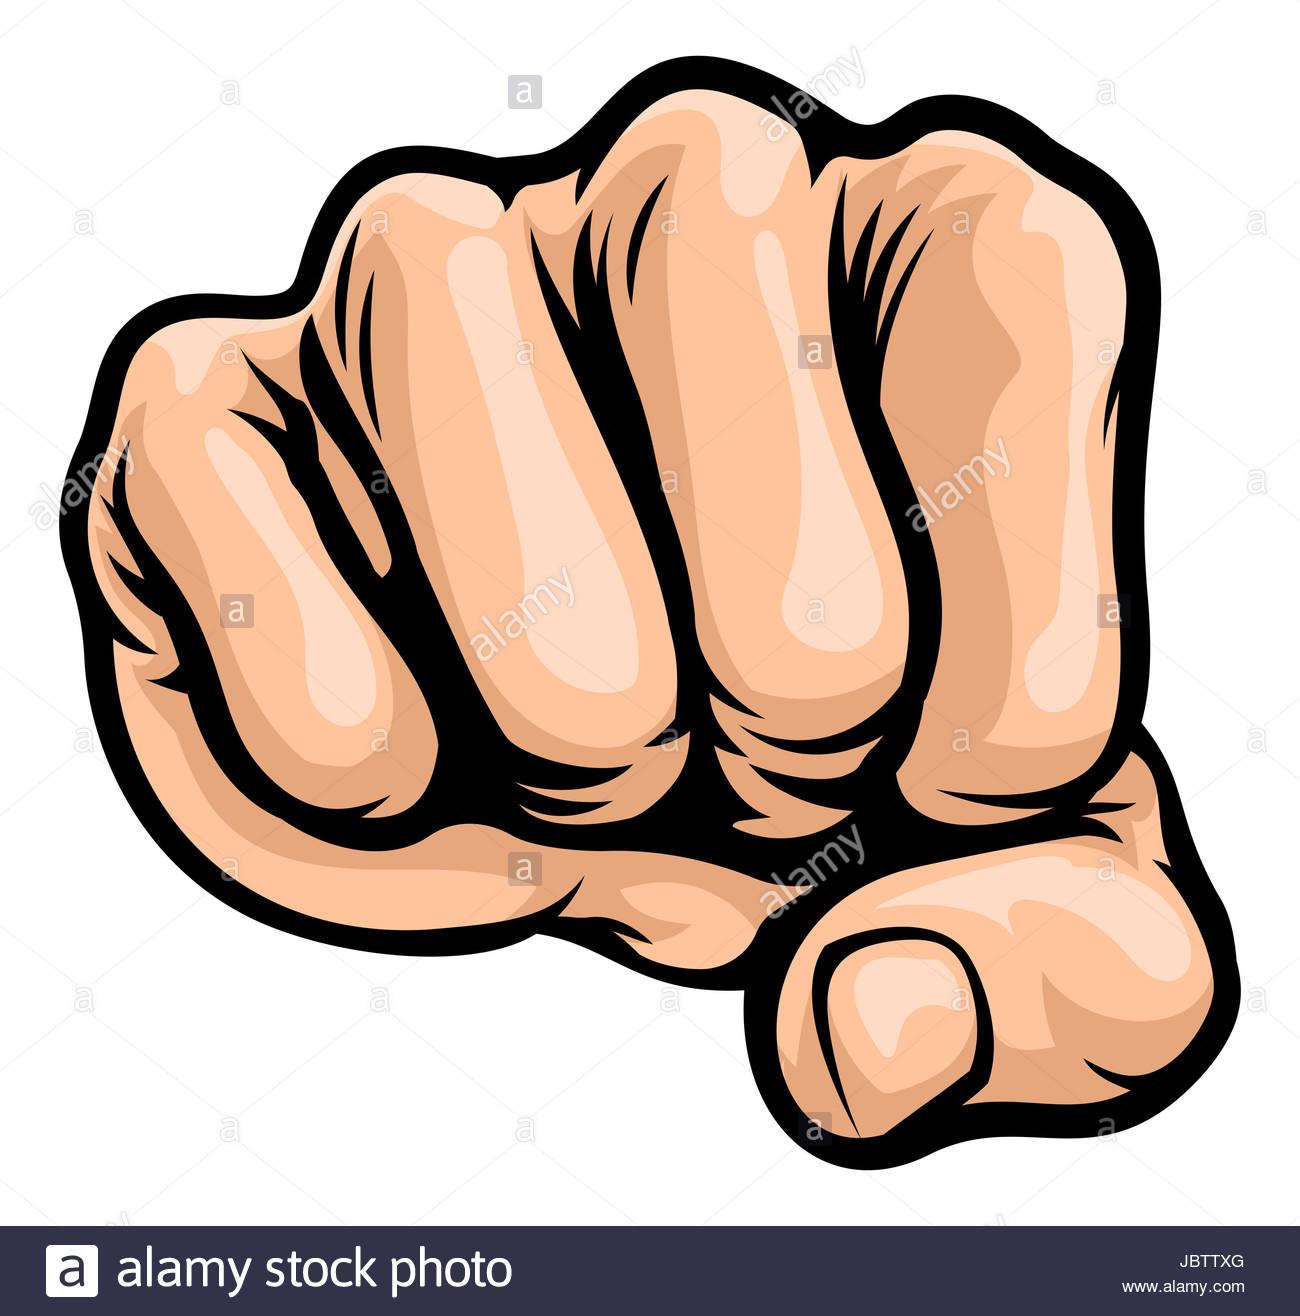 1300x1316 A Pop Art Comic Book Style Punching Cartoon Fist Stock Photo